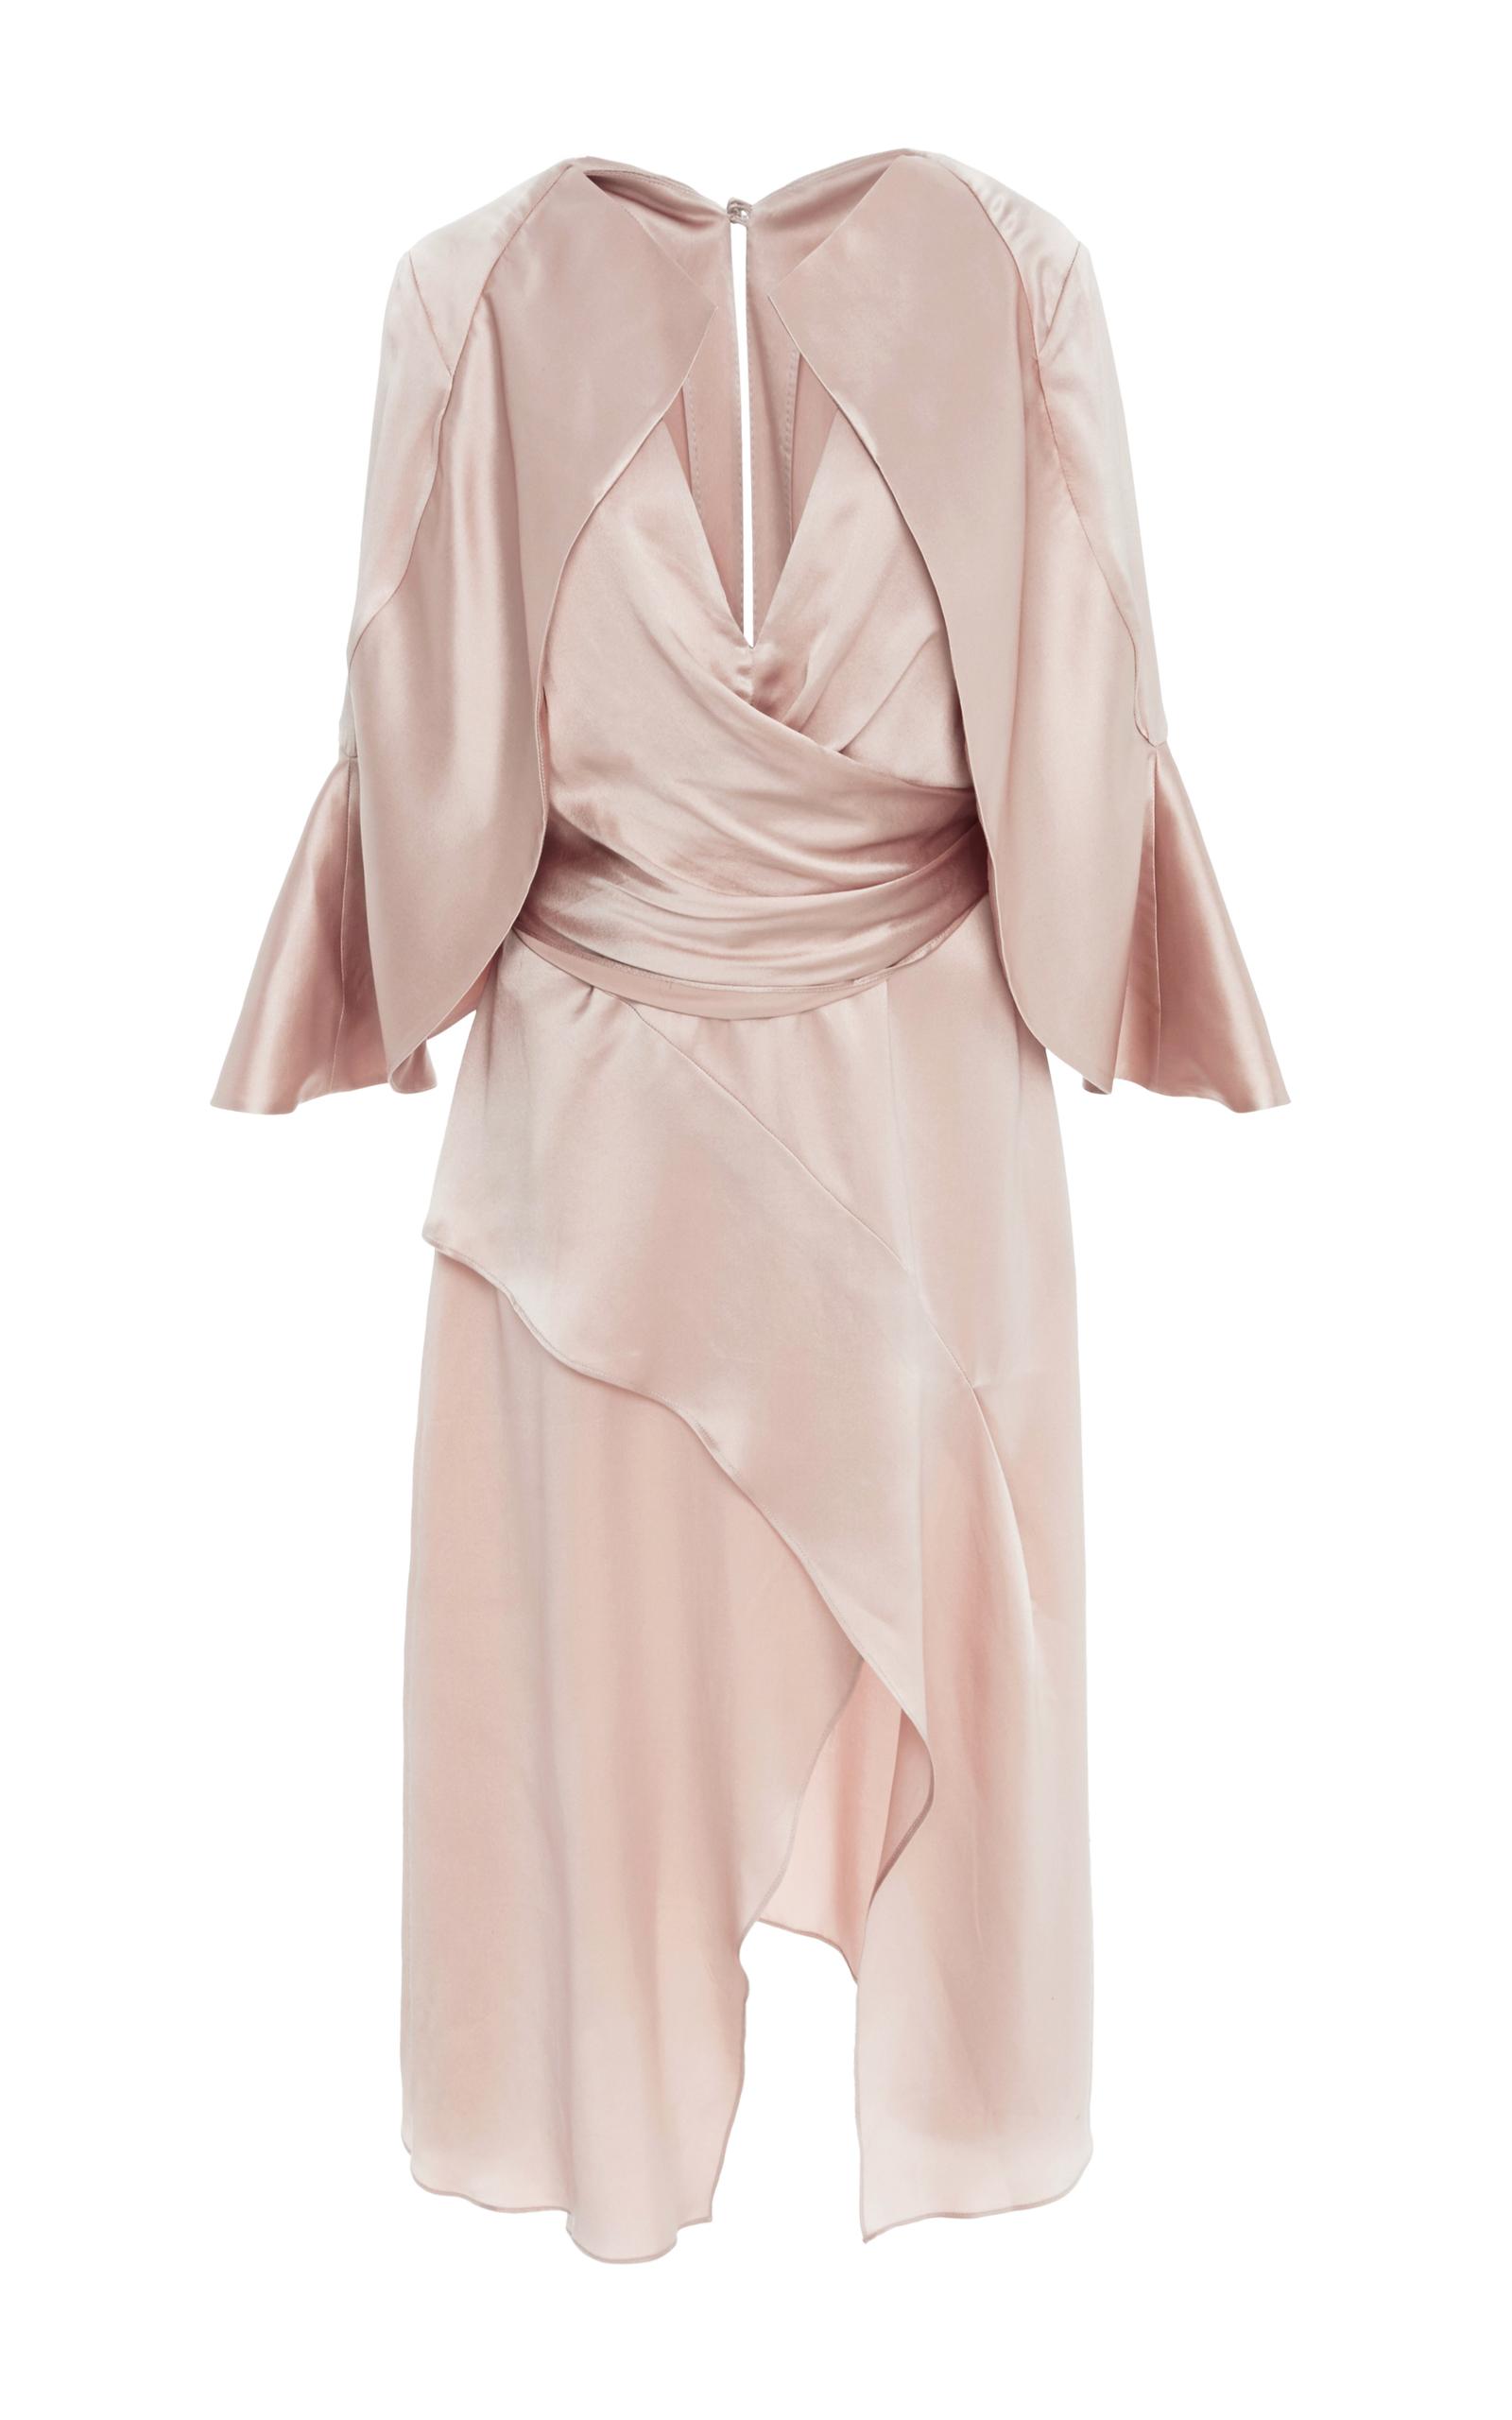 f3053bdb9b71d AclerFlorence Rose Silk Dress. CLOSE. Loading